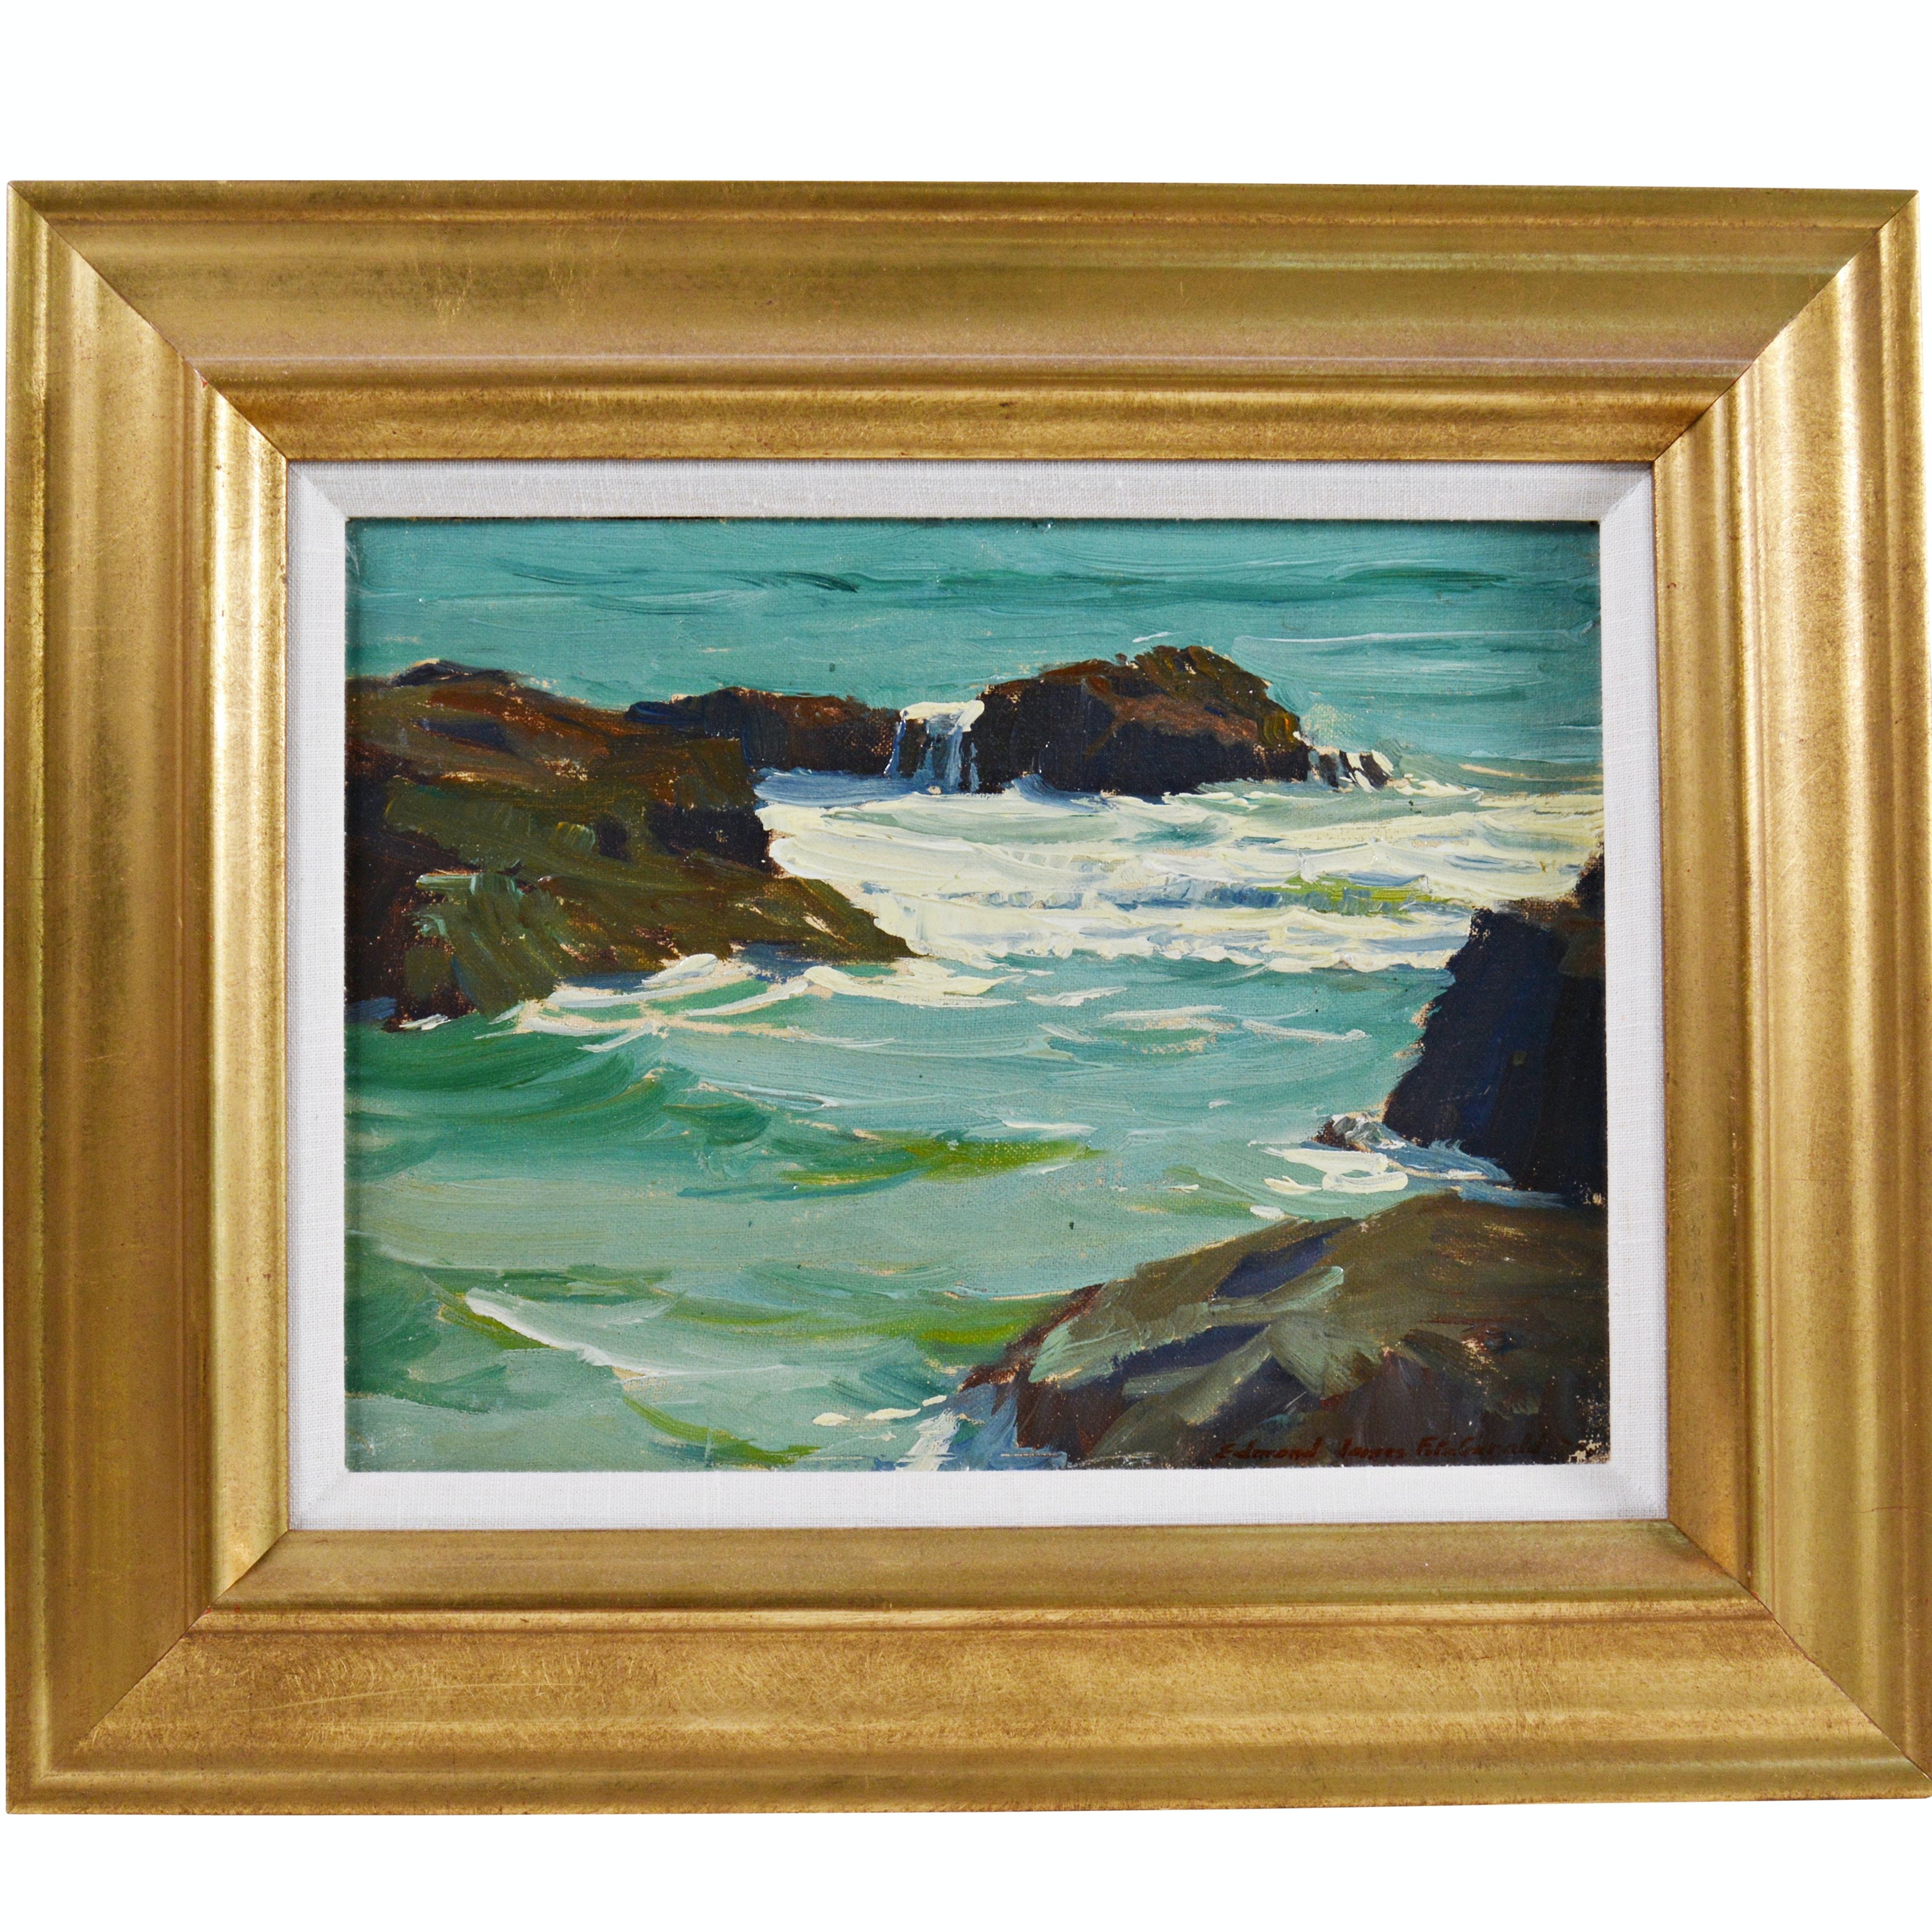 Edmond J. Fitzgerald Original Oil Painting of Ocean Scene